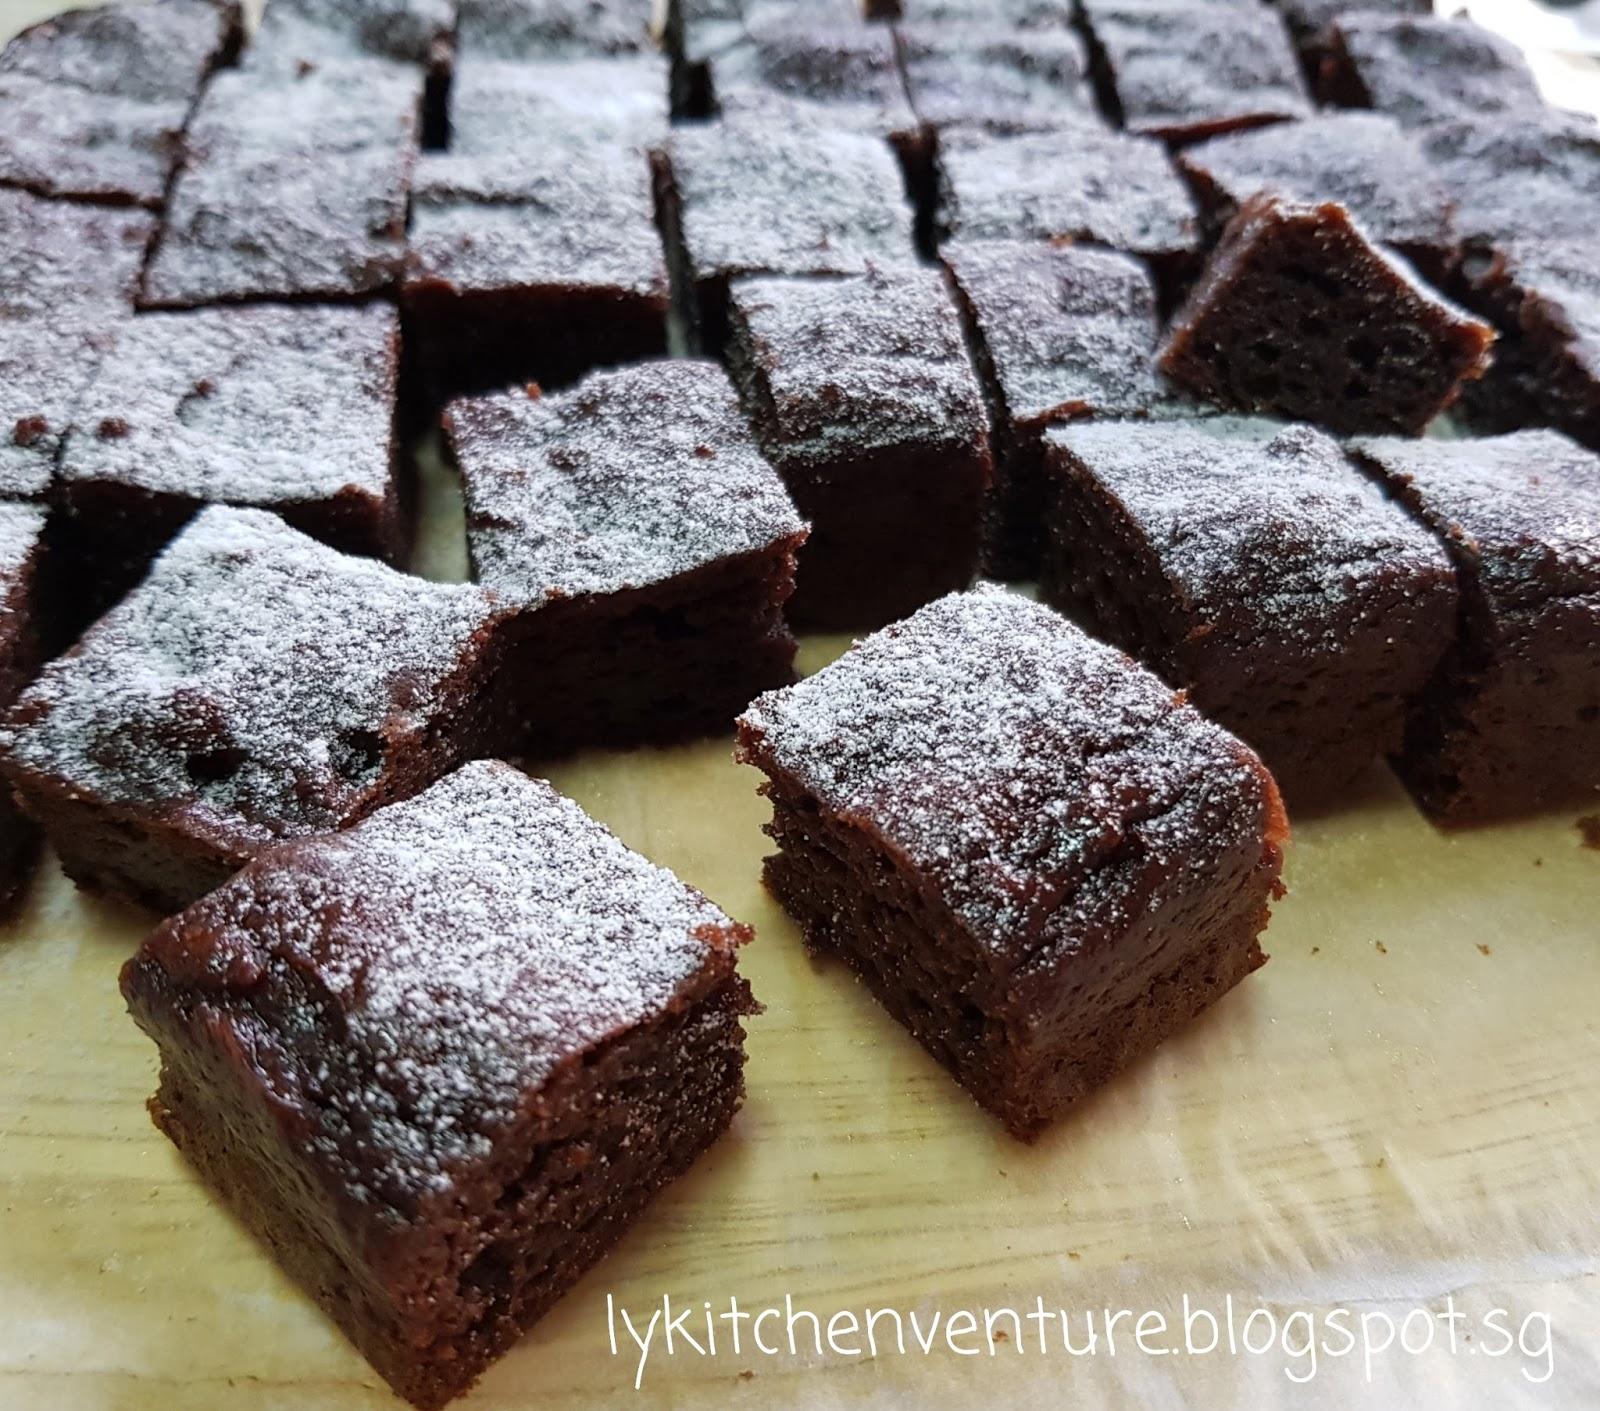 Ly S Kitchen Ventures Avocado Brownies